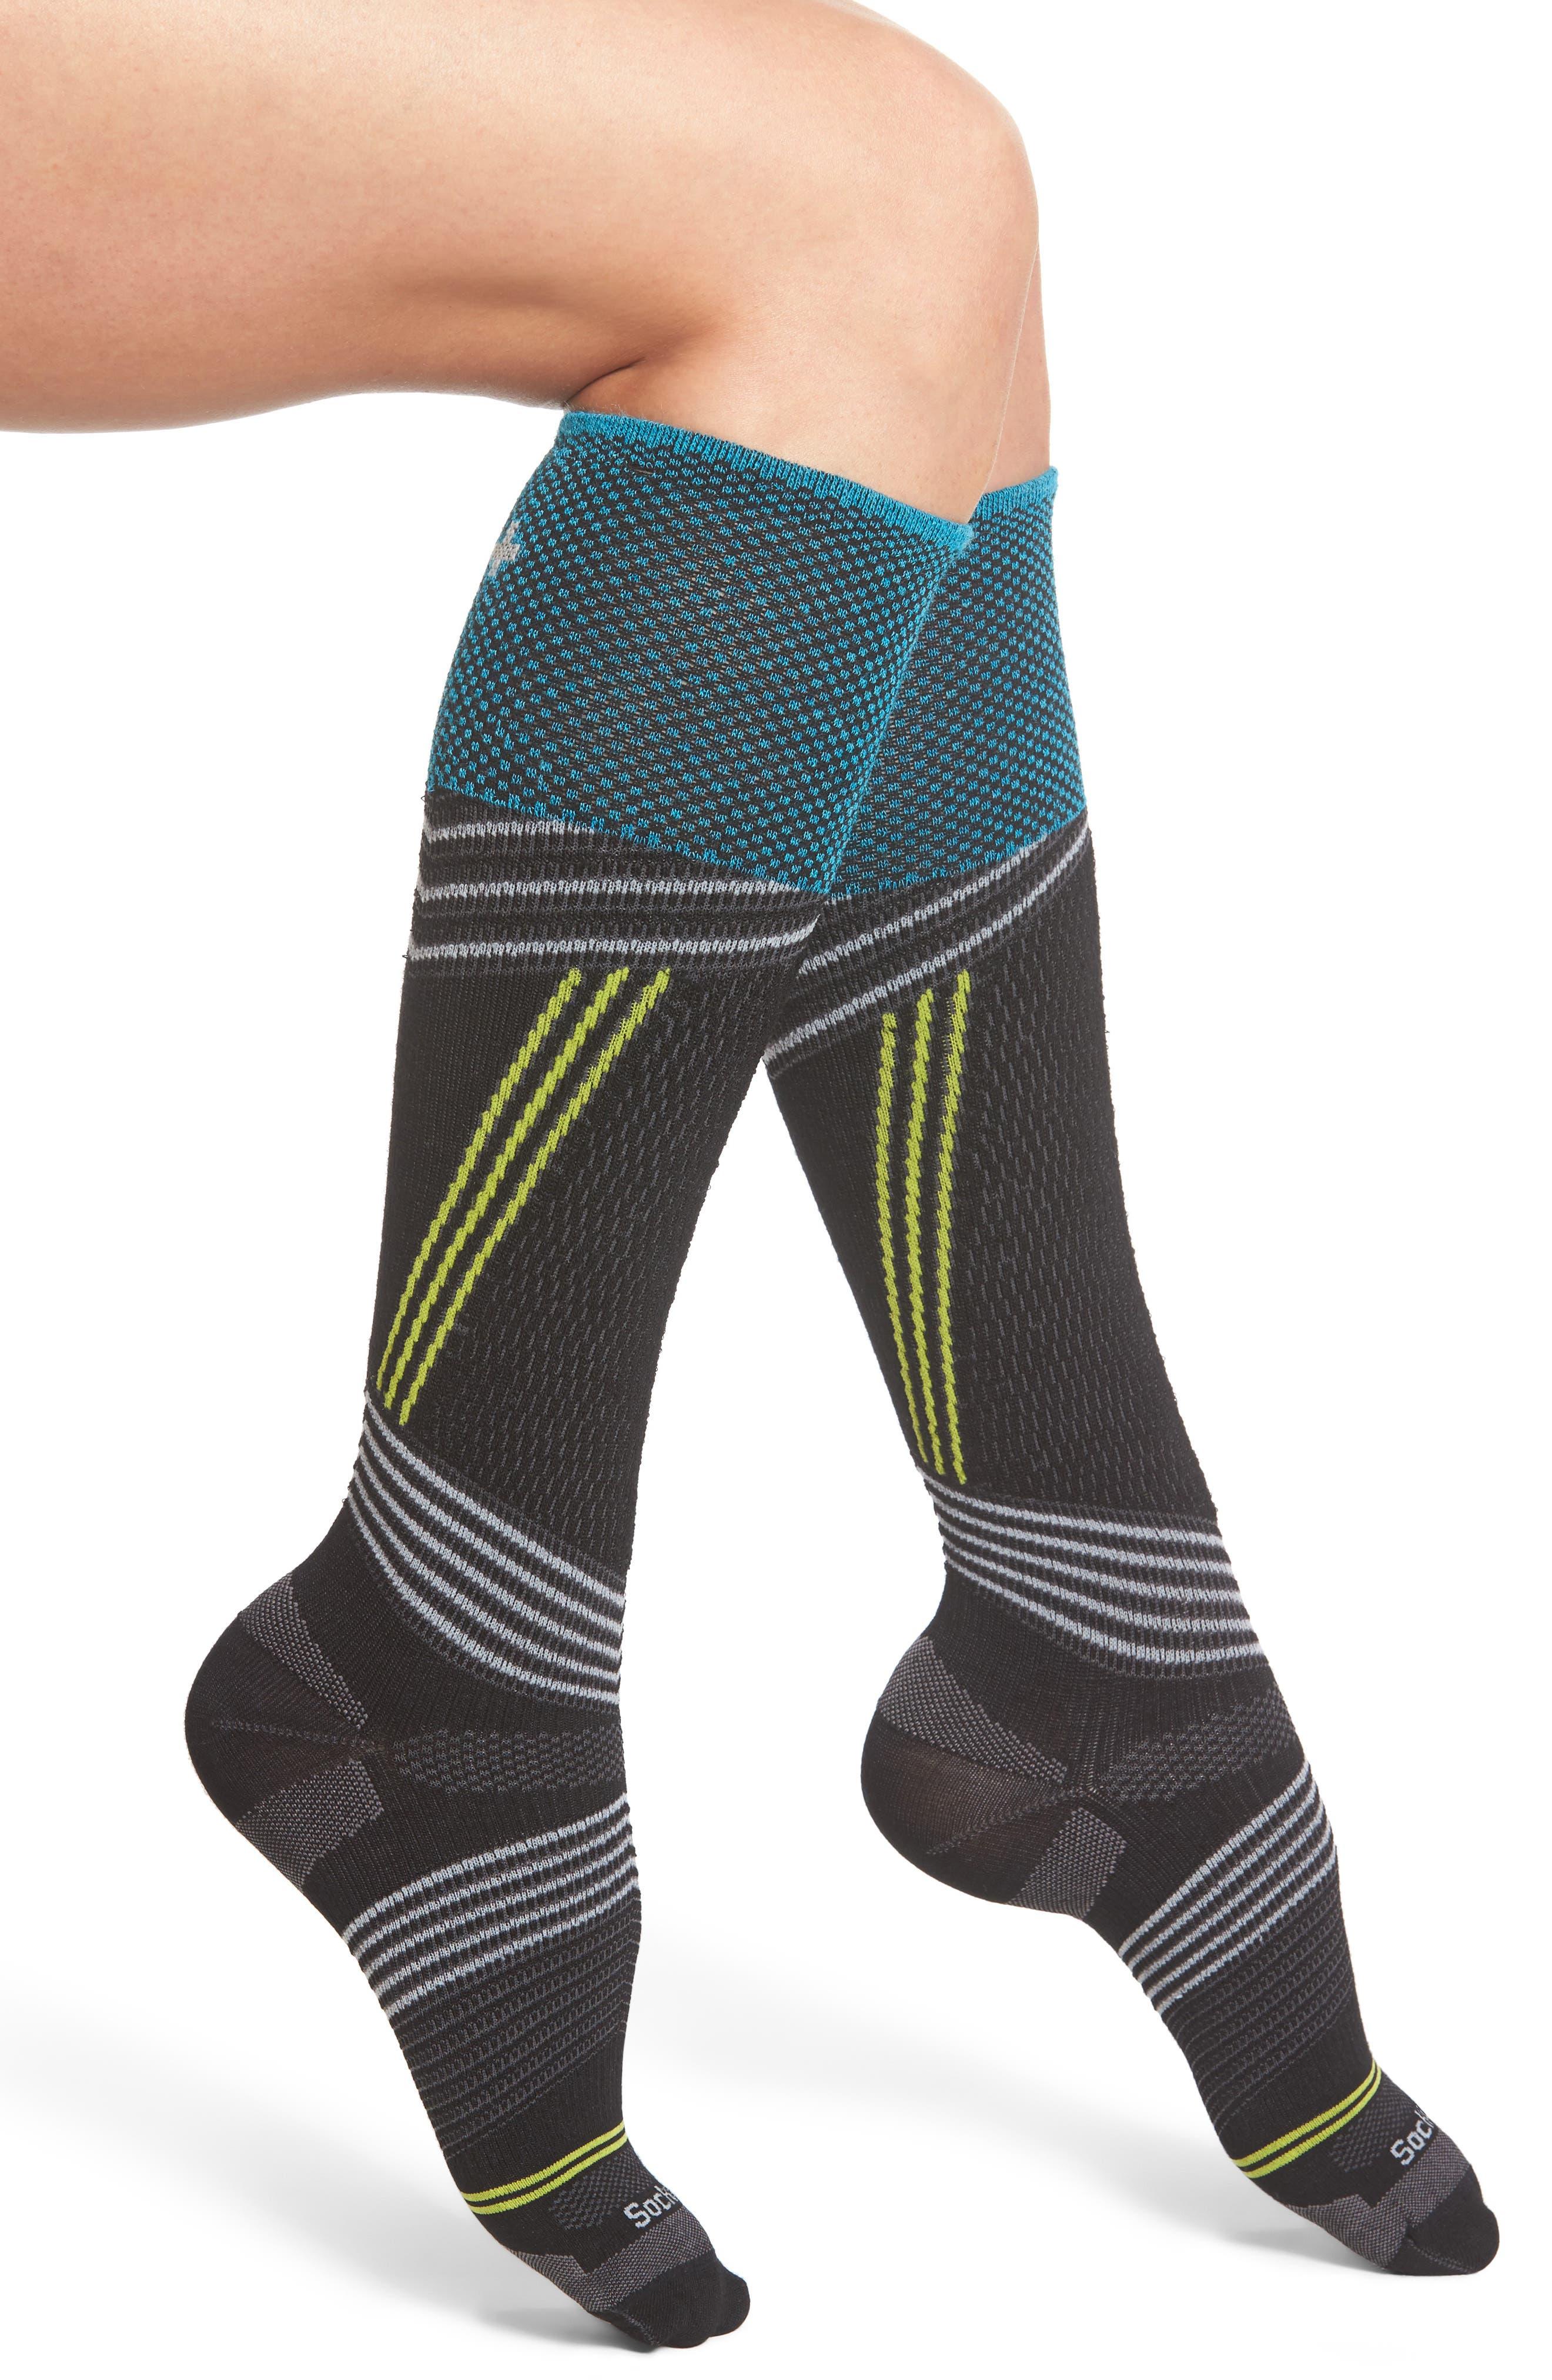 Main Image - Sockwell Ski Alpine Racer Compression Knee Socks